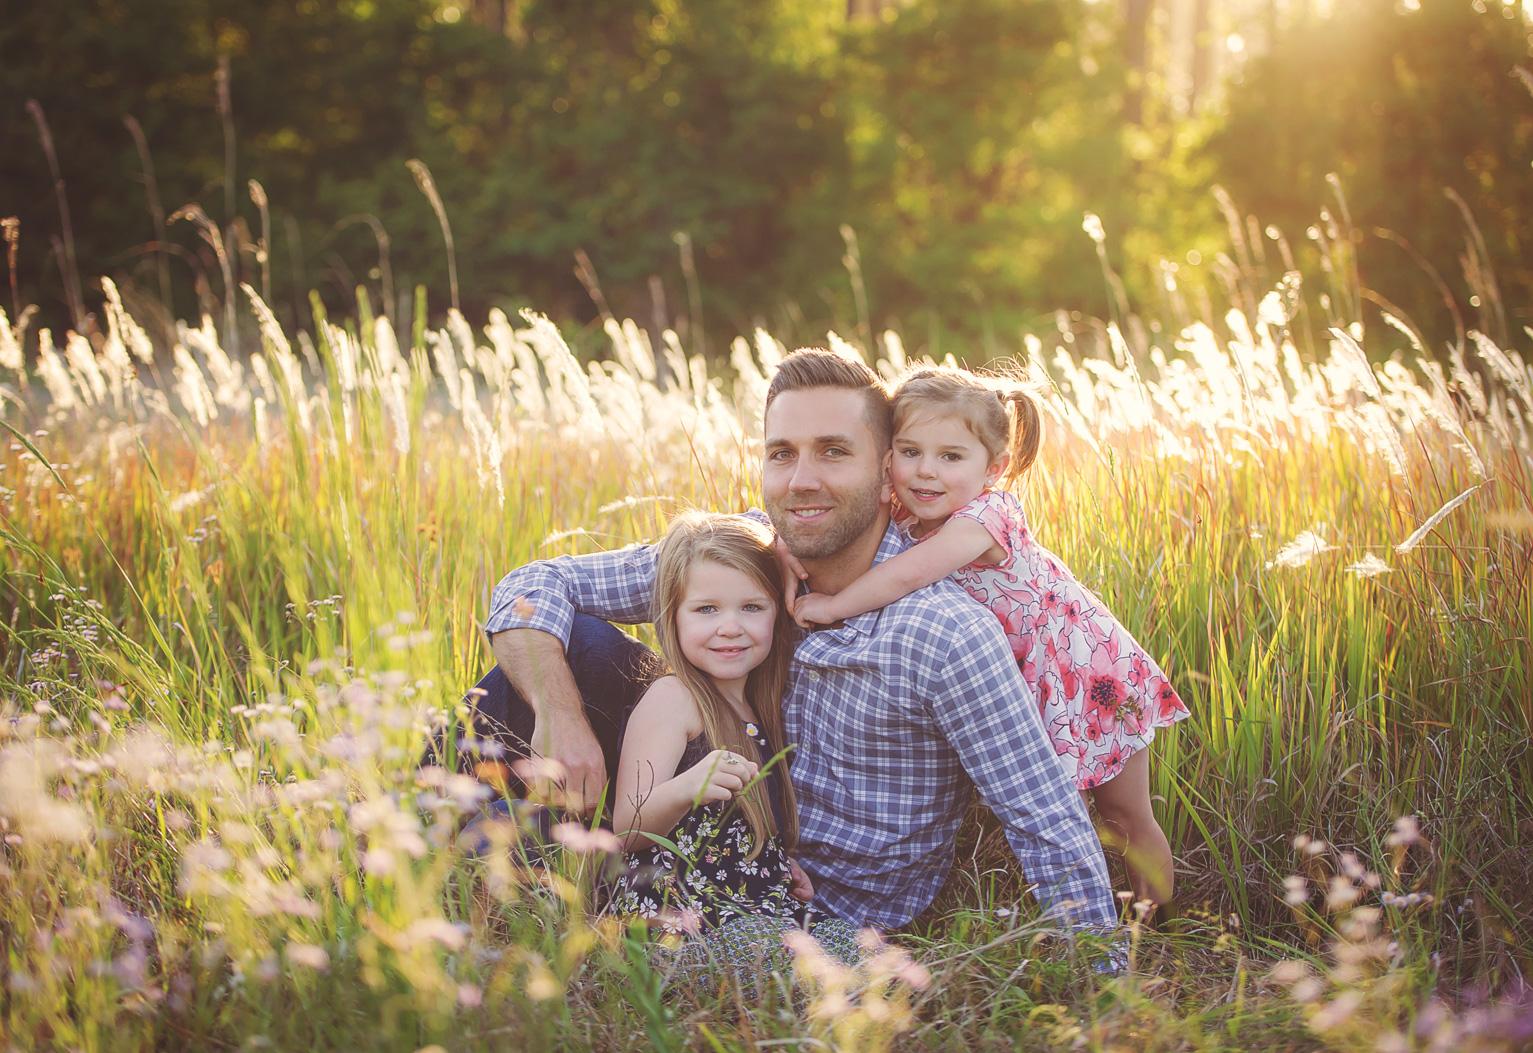 adam-szarmack-family-portraits-photography-love-17.jpg